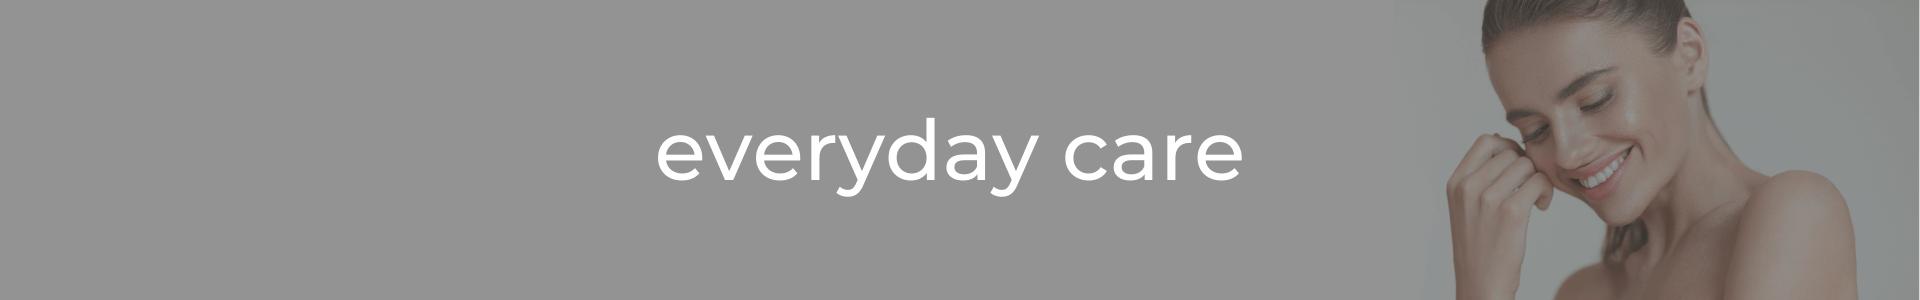 Everyday Care 1